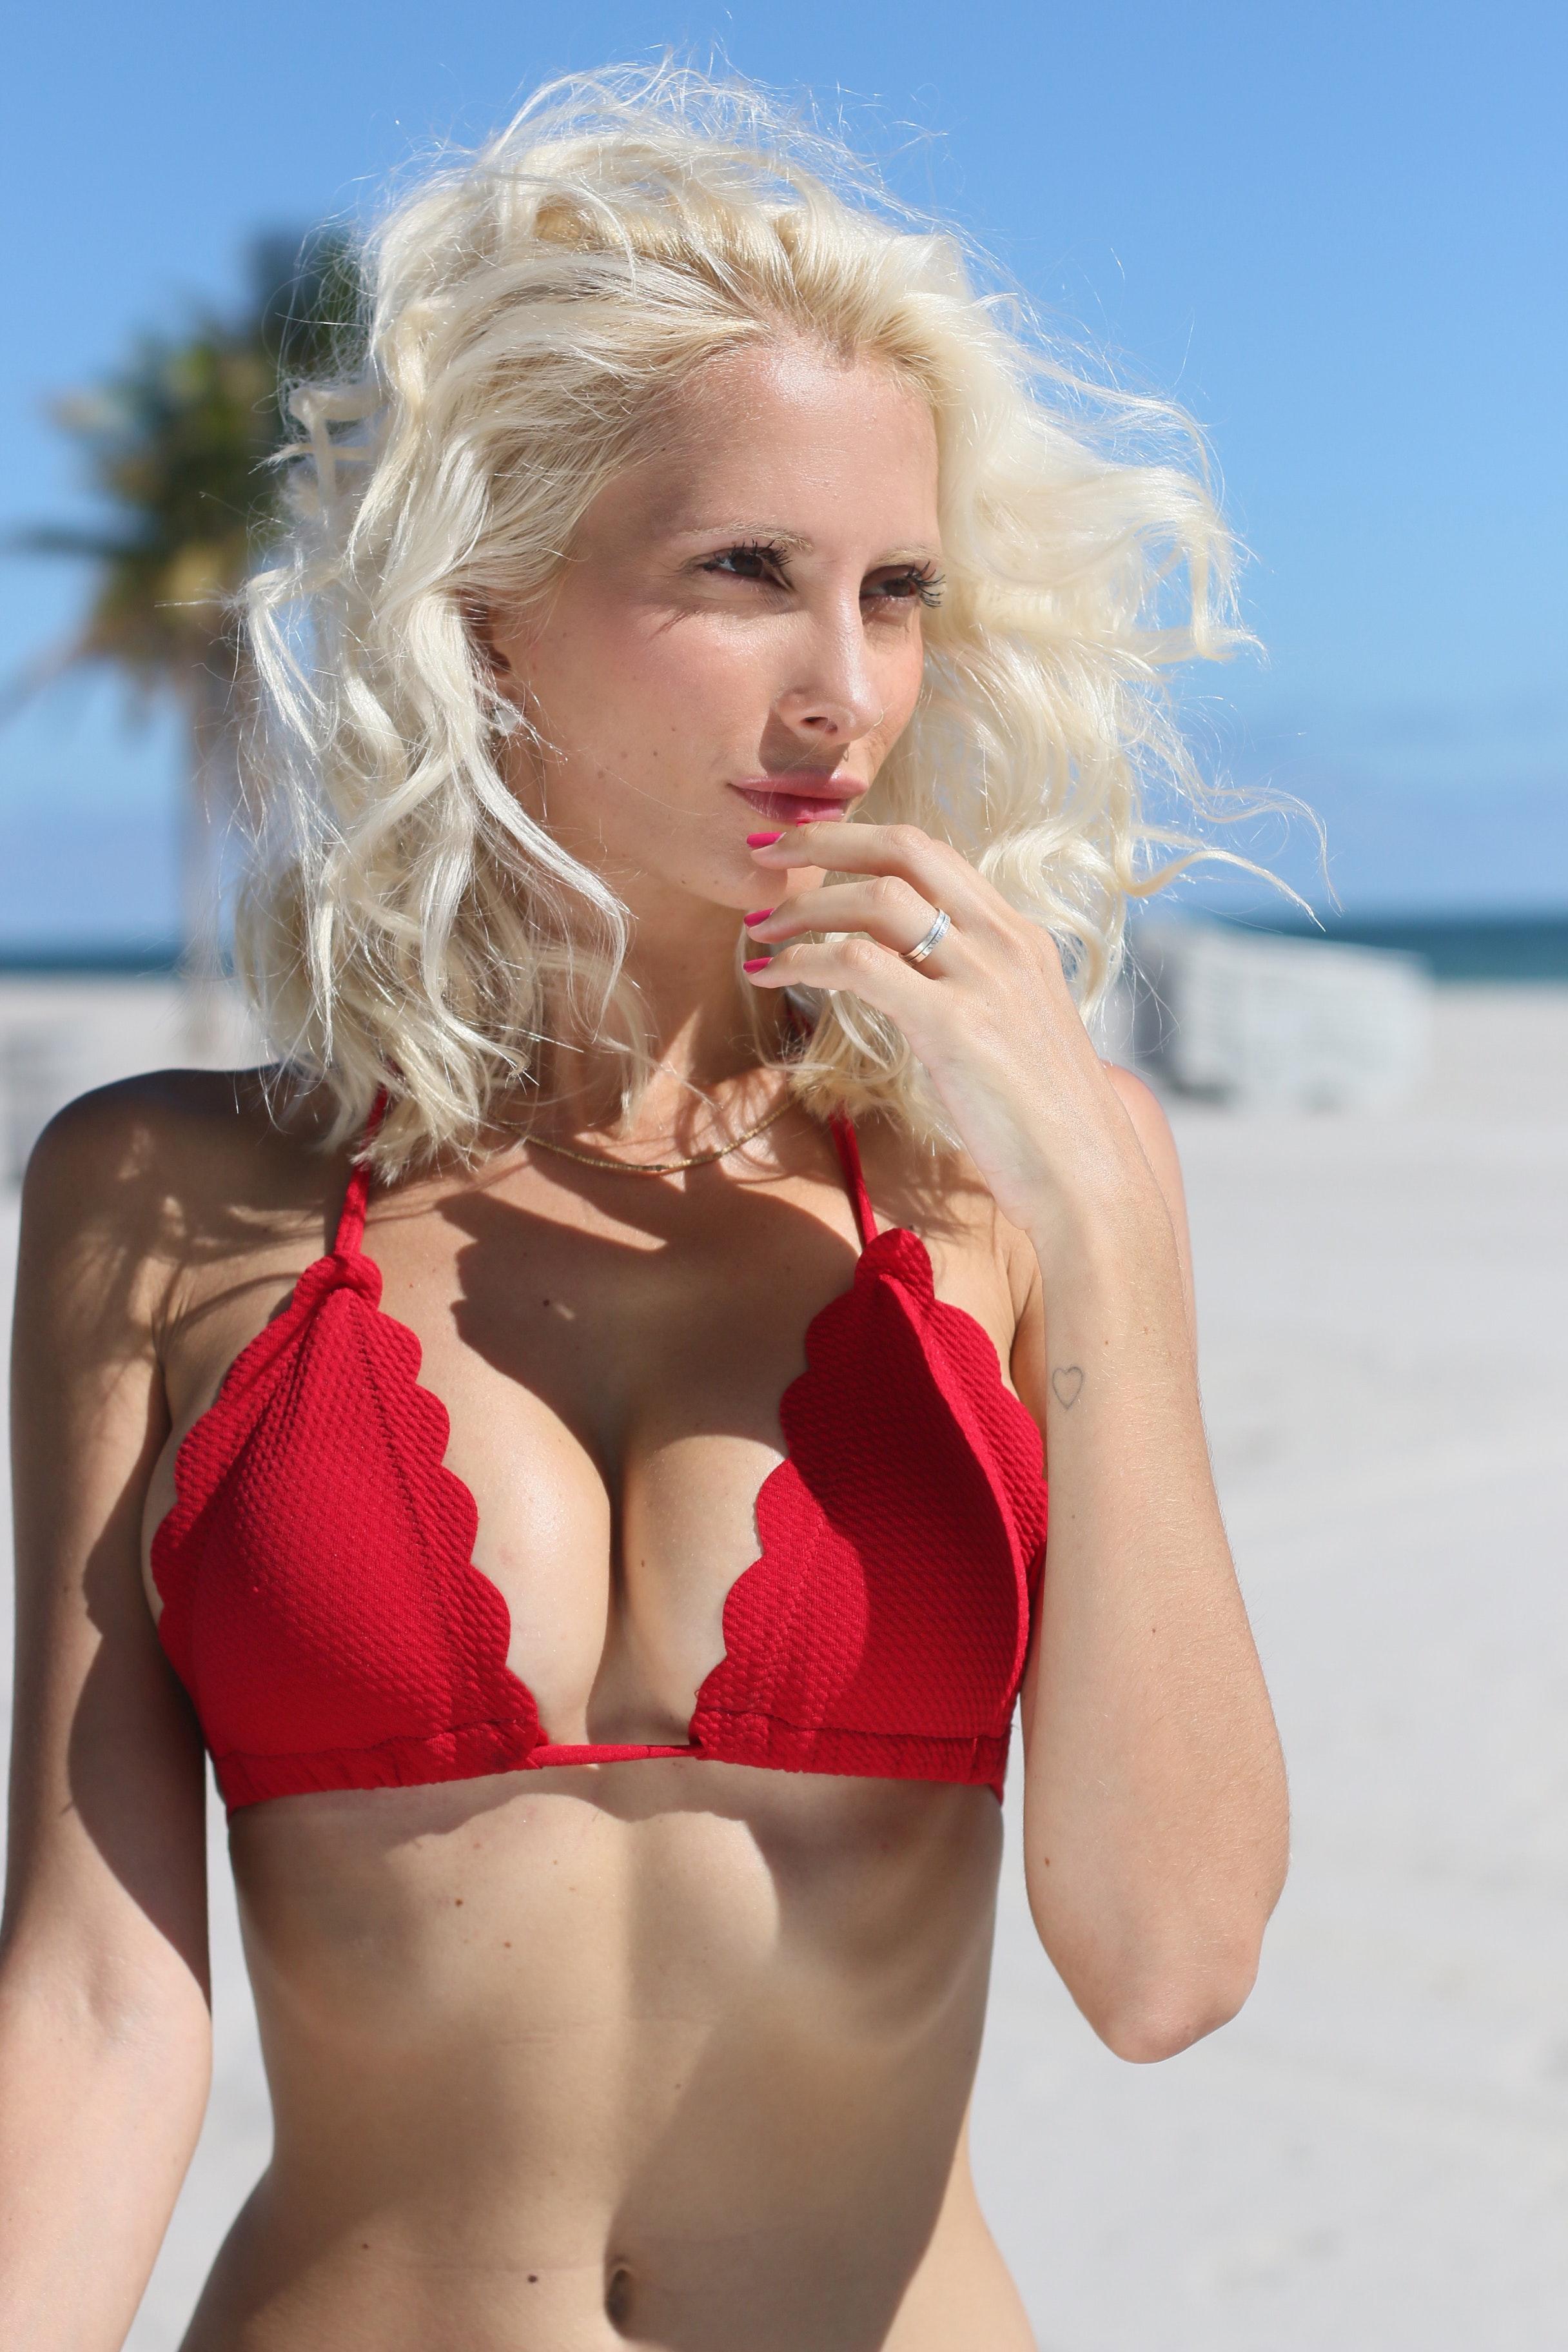 Blonde hair woman wearing red bikini photo